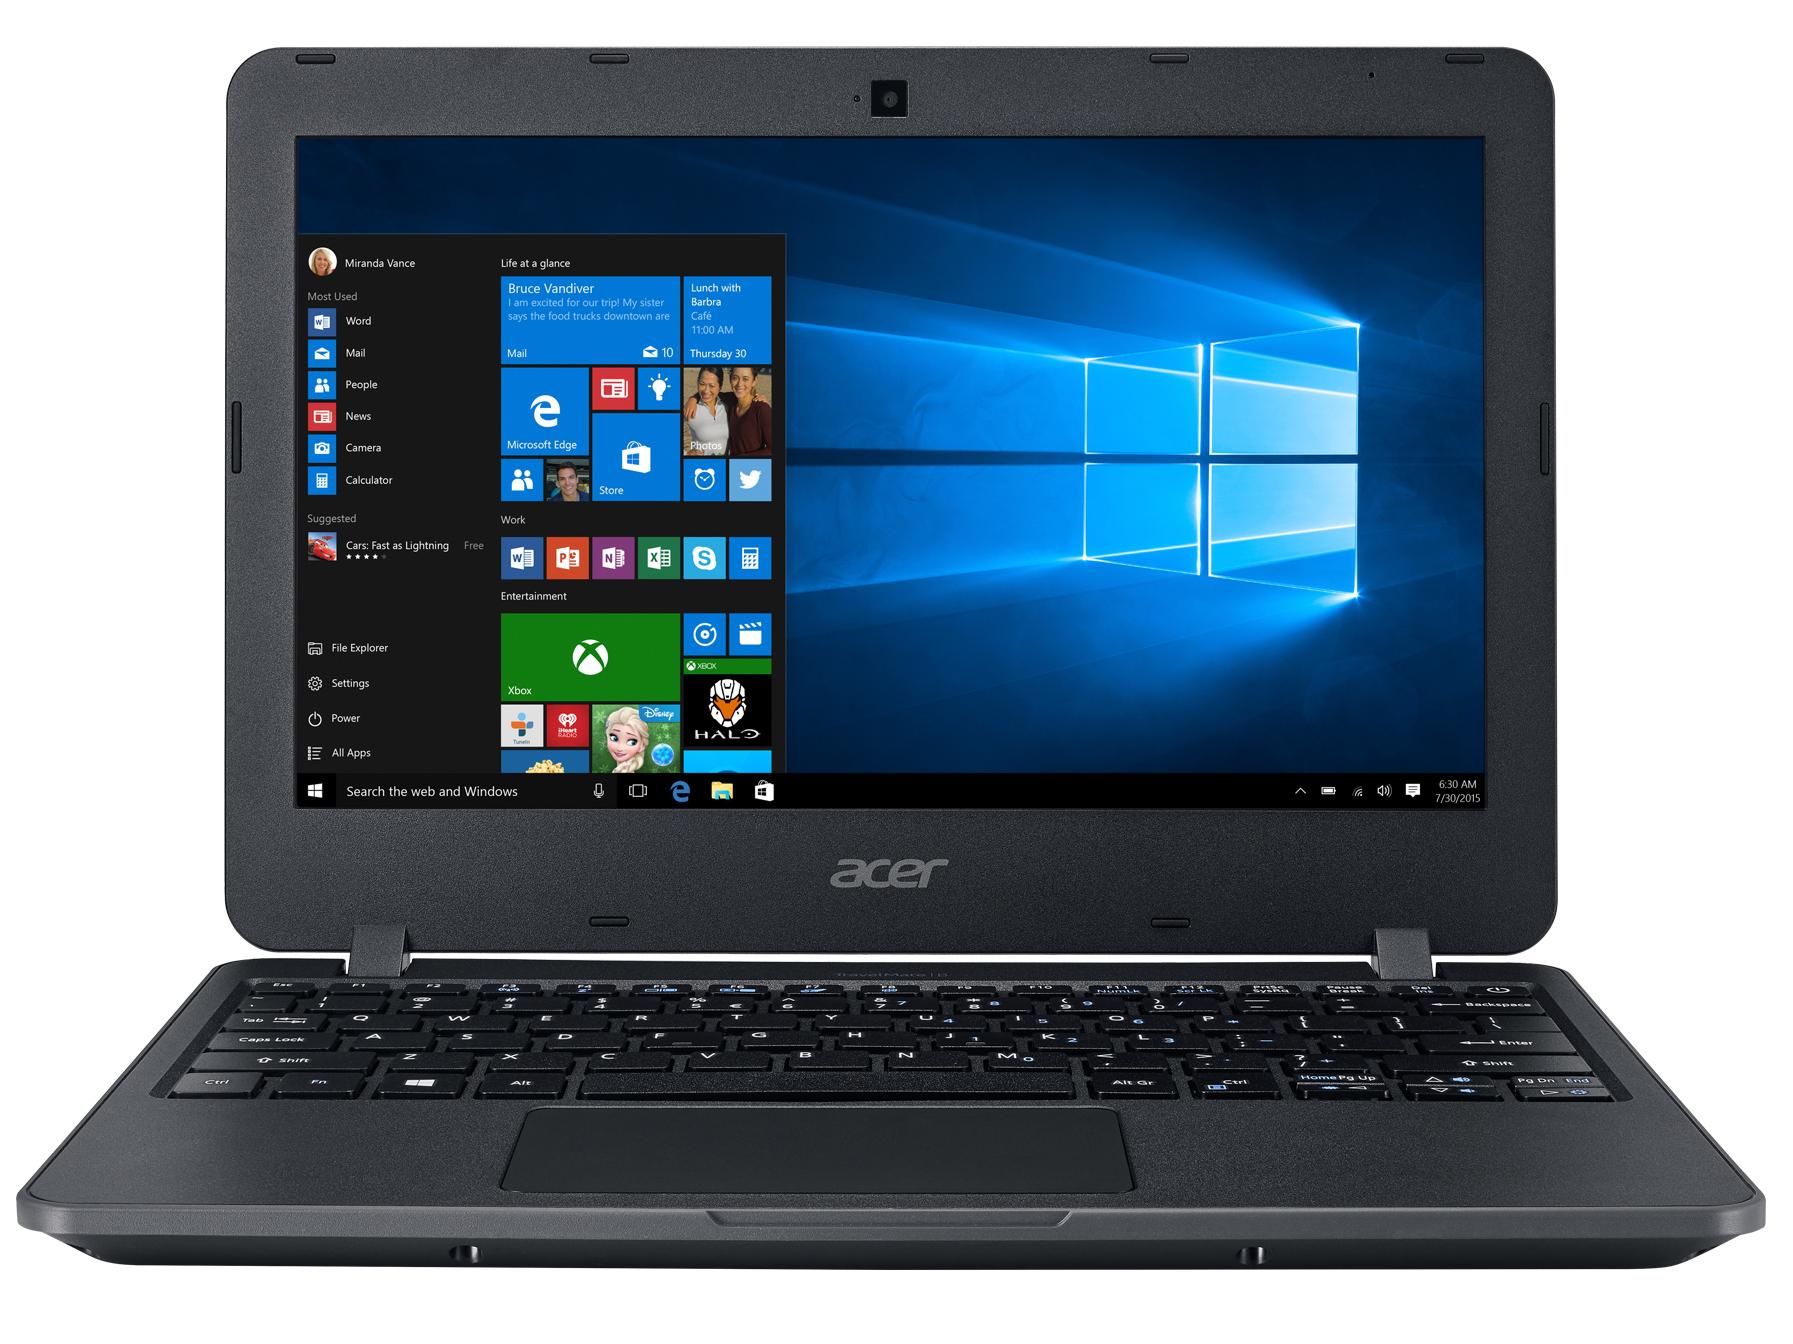 Acer TravelMate B117-M Realtek Card Reader Drivers for Windows 10